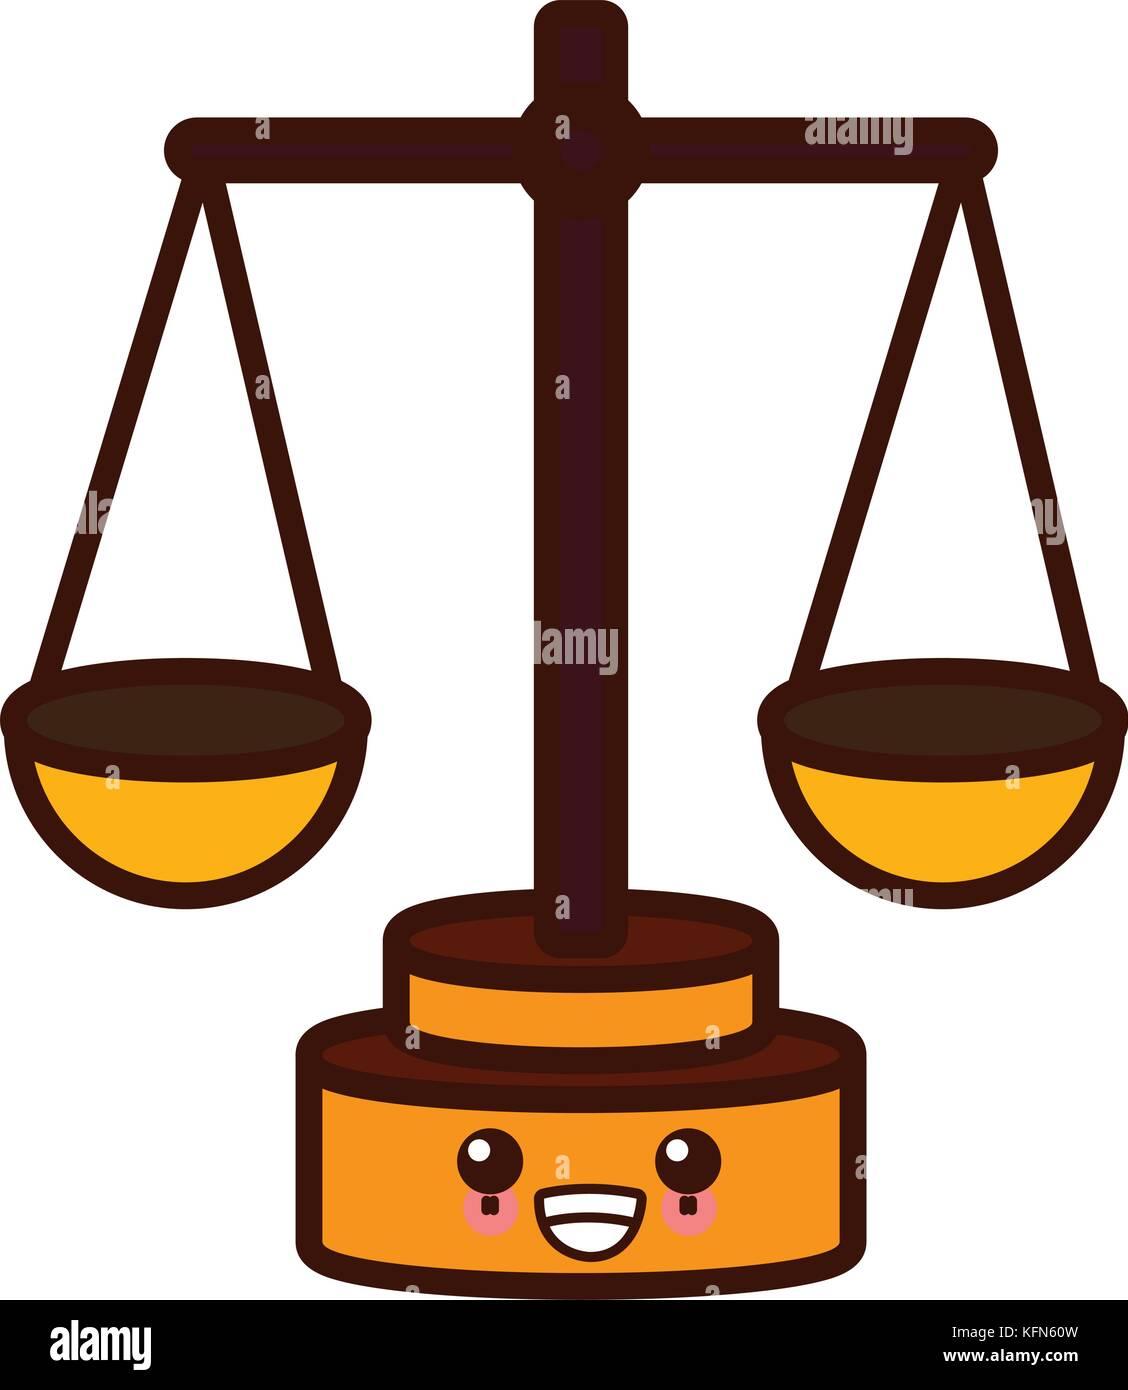 justice balance symbol cute kawaii cartoon - Stock Vector